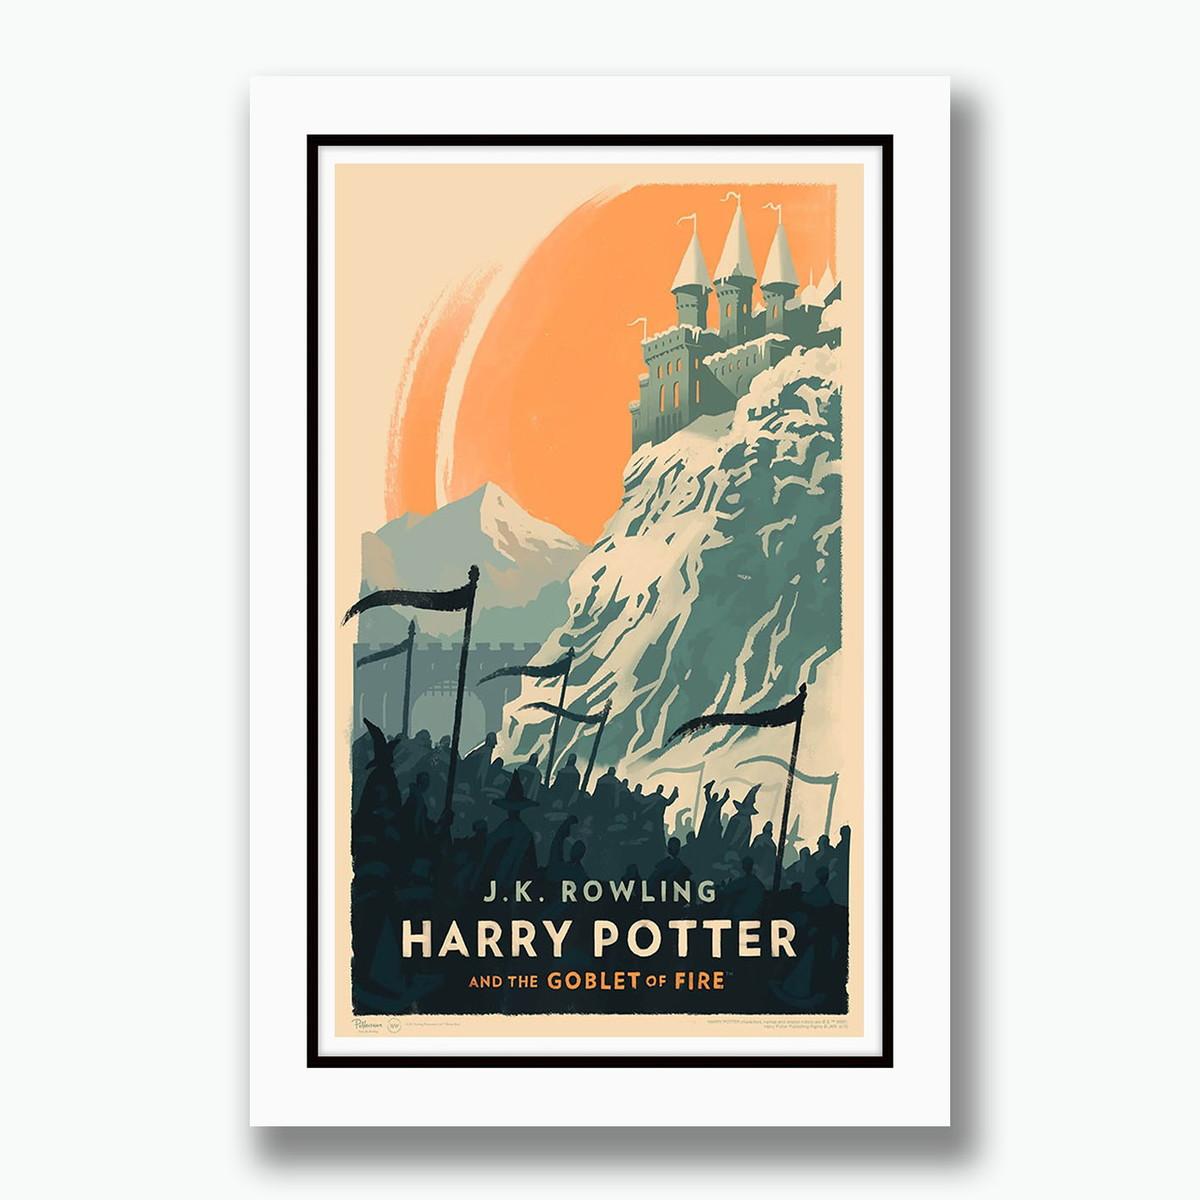 Quadro Harry Potter Filme Fv Minimalista No Elo7 Gynposters 994aed